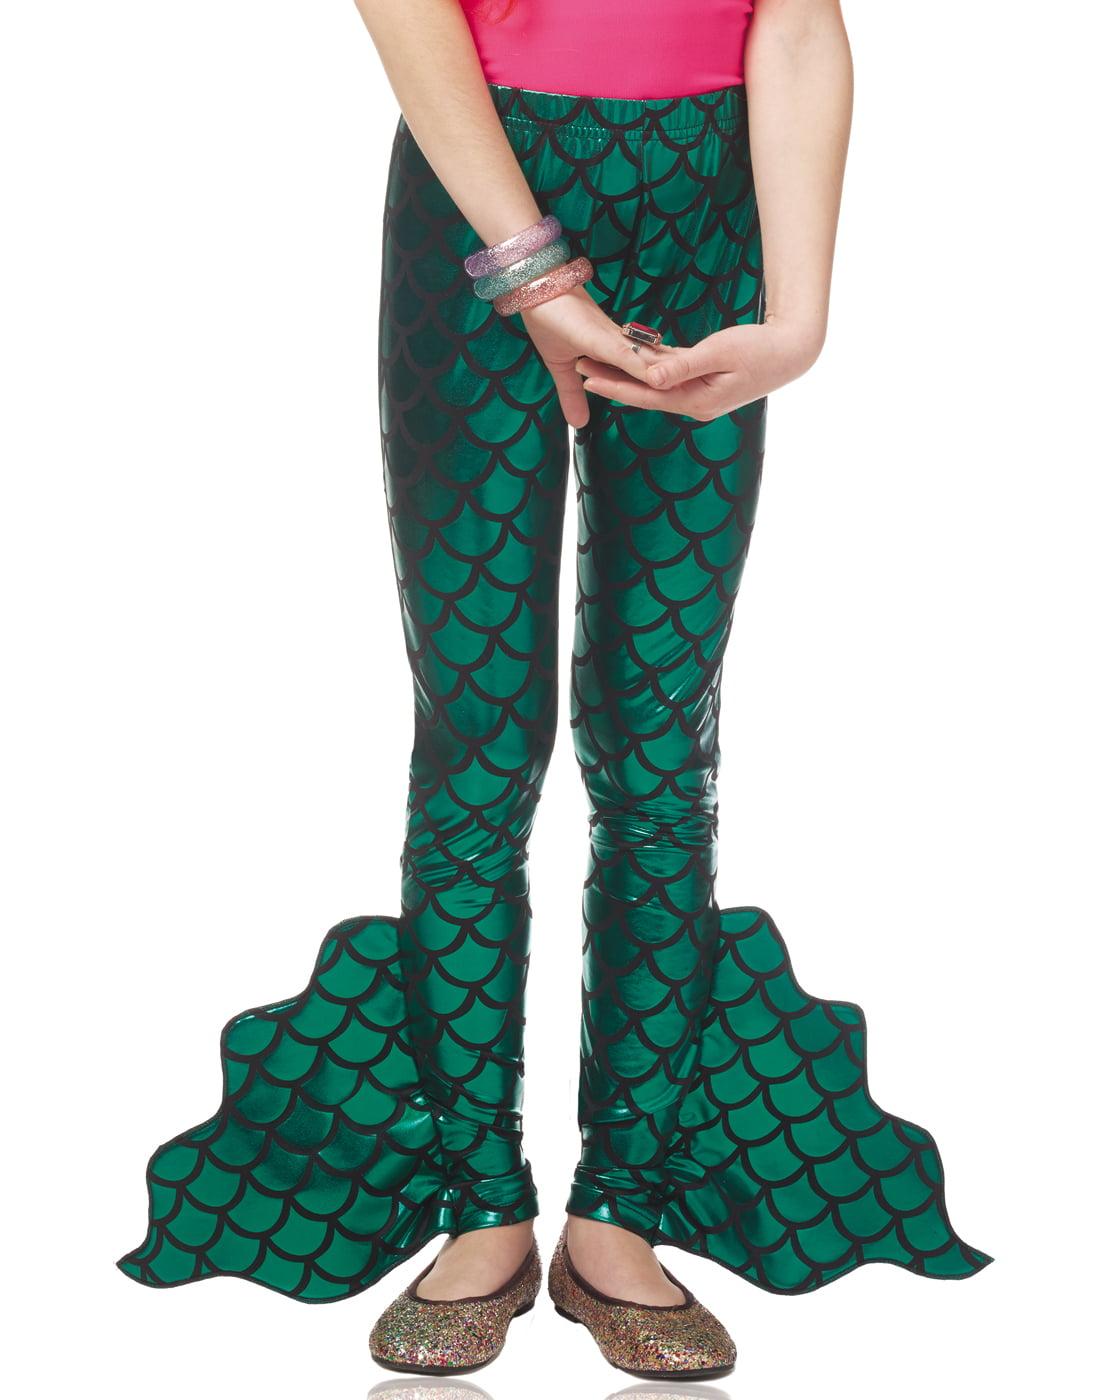 Mermaid Pants Green Fin Mythical Creature Girls Child Costume Leggings-M